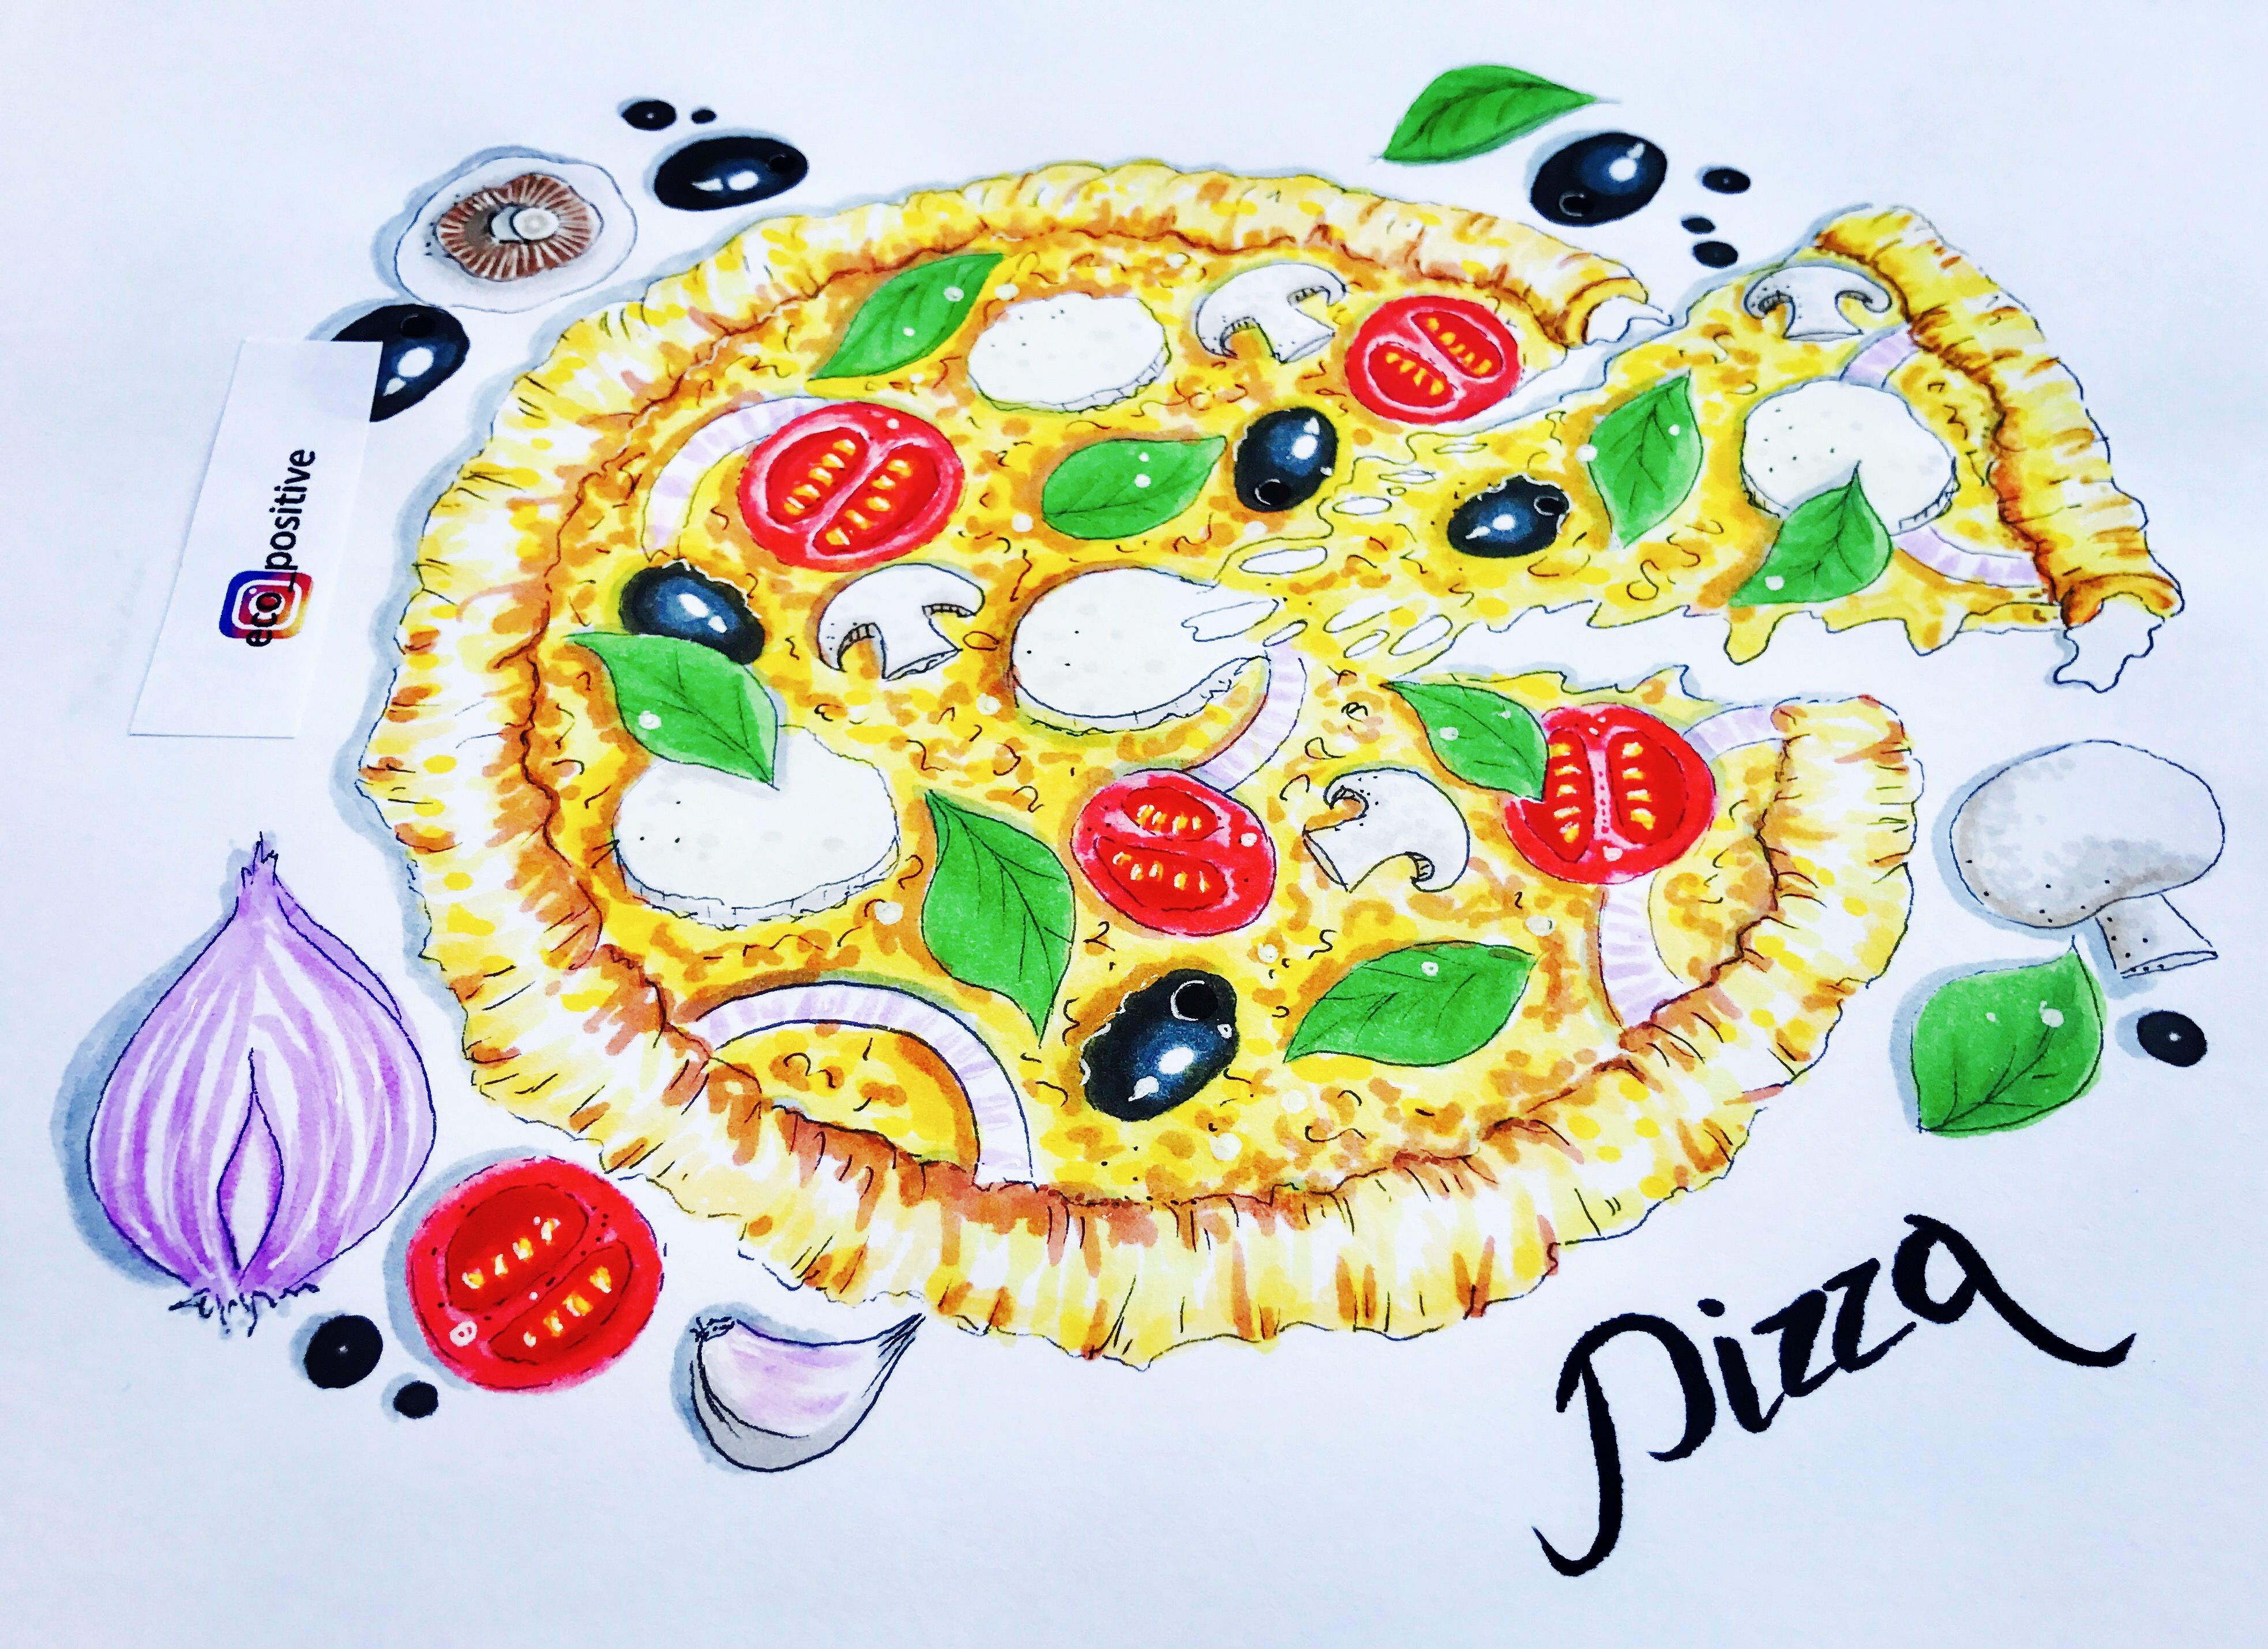 3932x2859 Pizza Illustration Drawing Logo Food Sketching Restaurant Italian